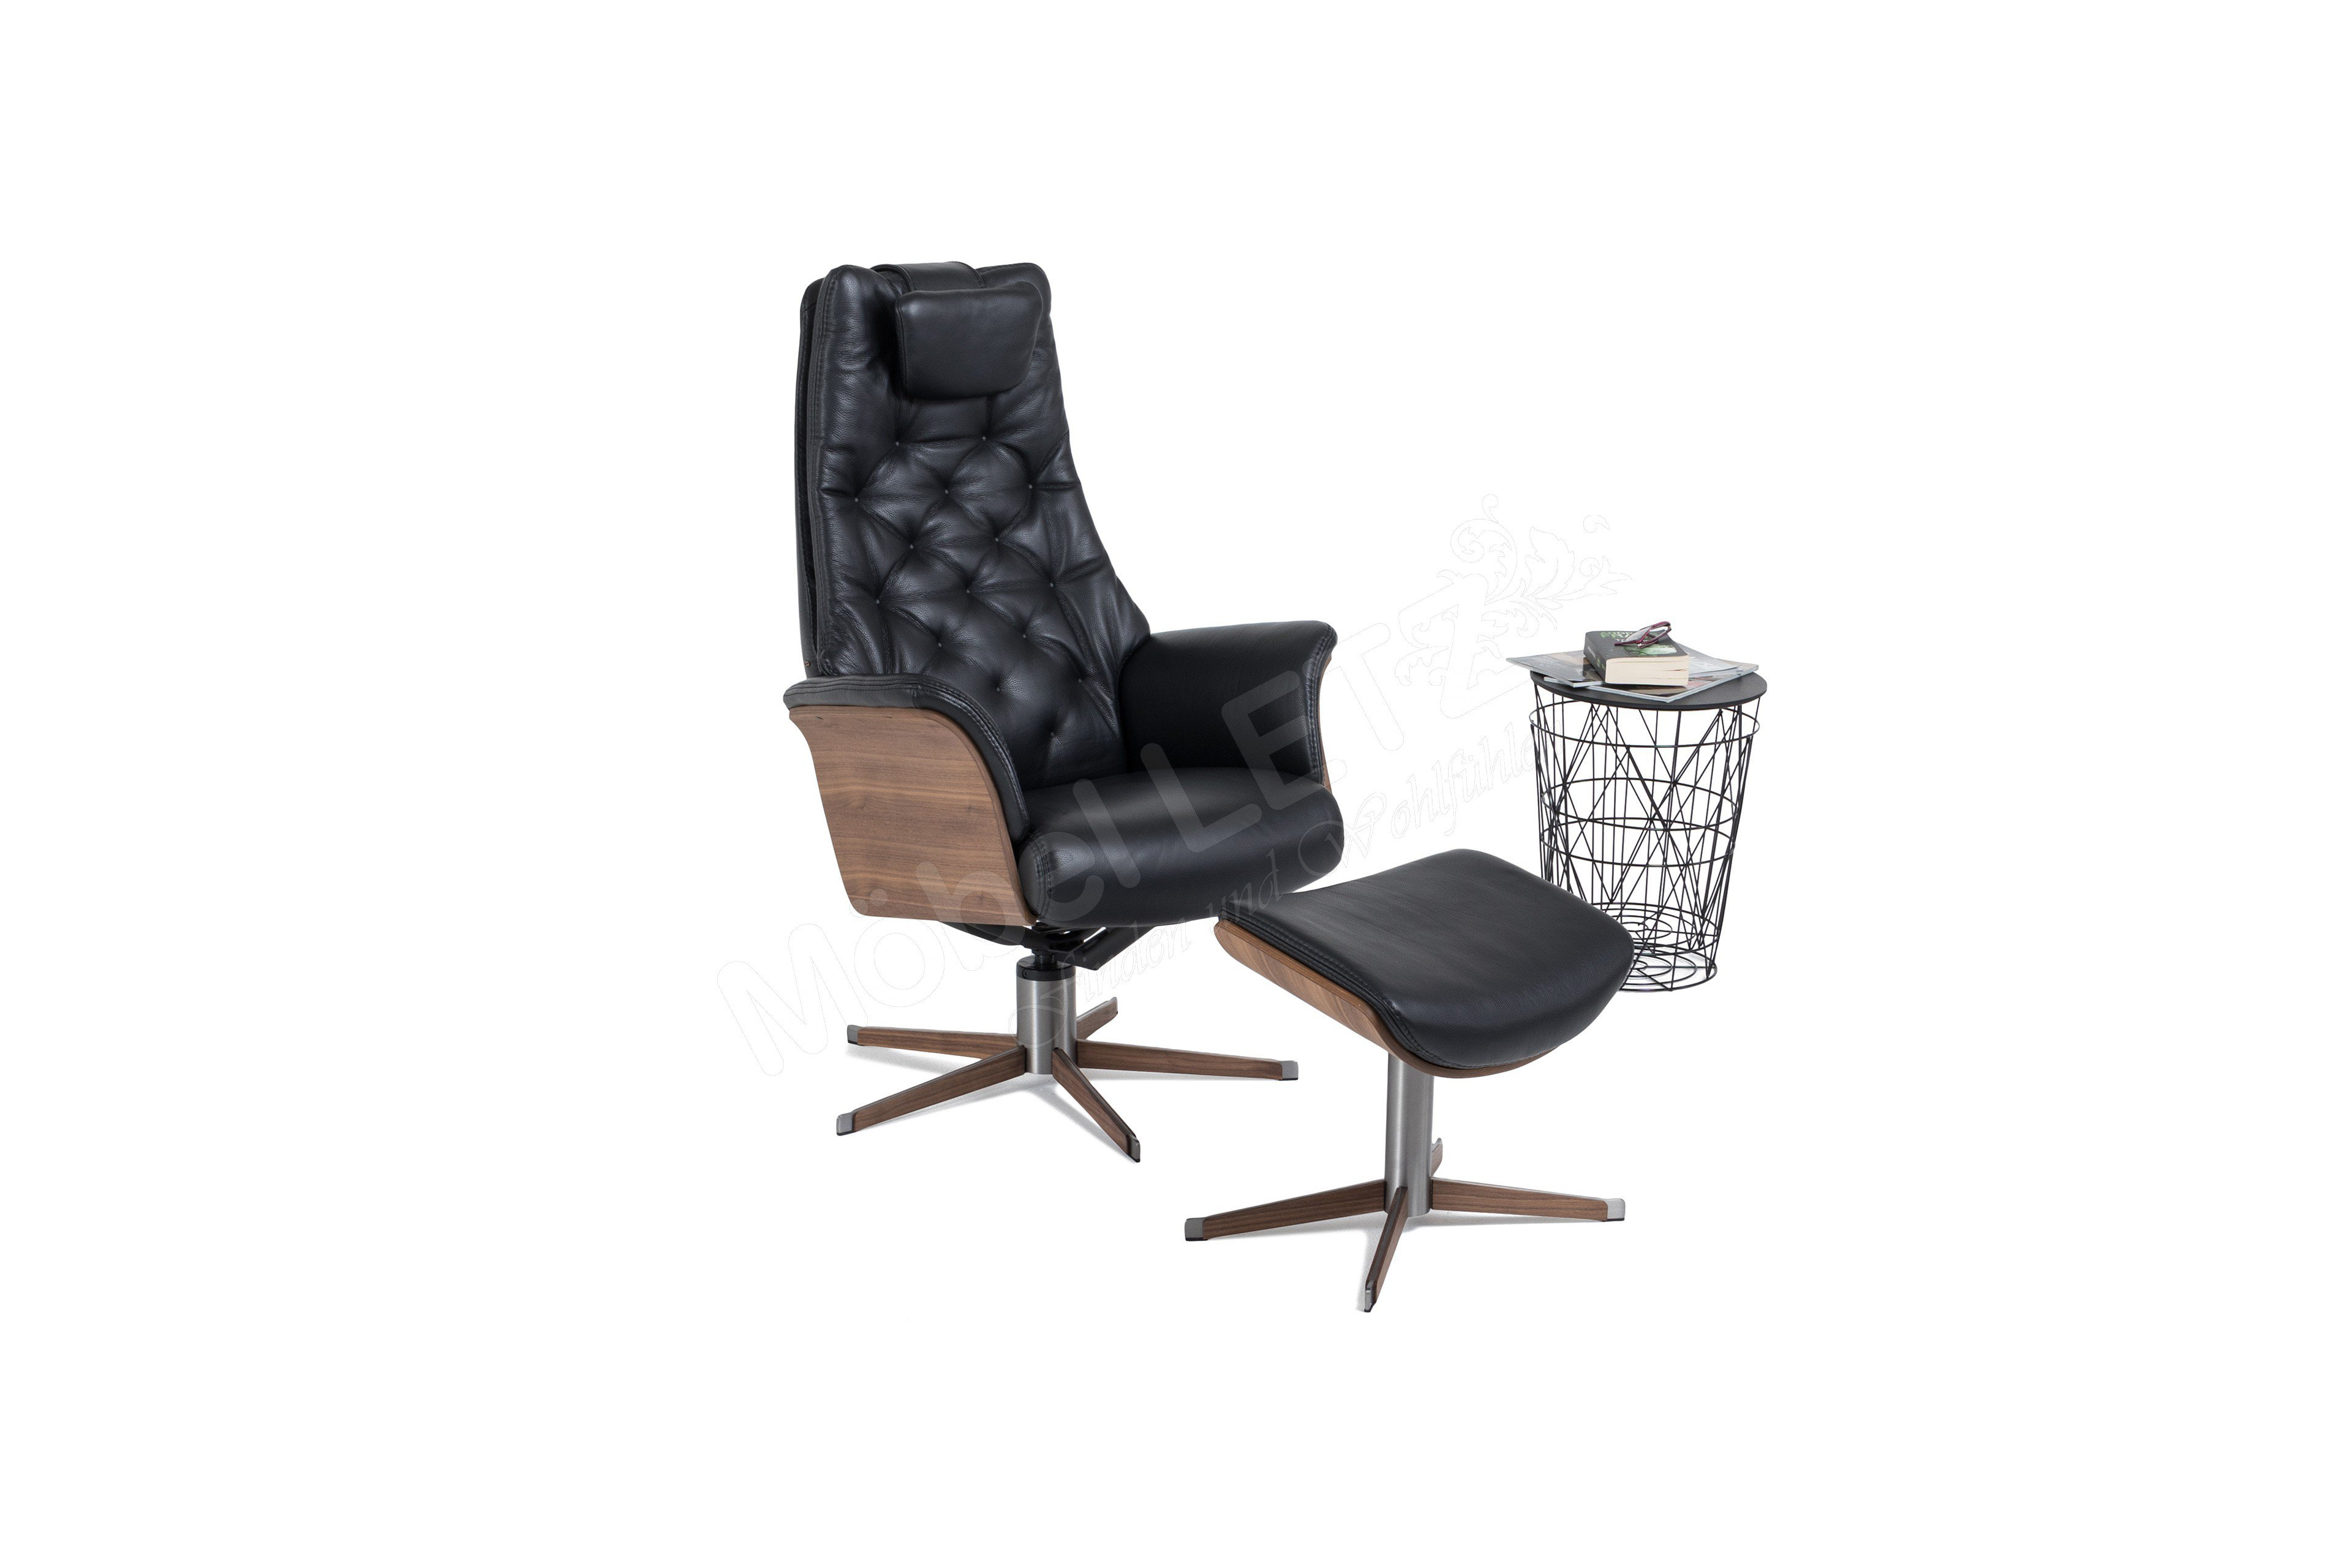 funktionssessel in schwarz mit rautensteppung inklusive hocker diamond bd m bel m bel letz. Black Bedroom Furniture Sets. Home Design Ideas